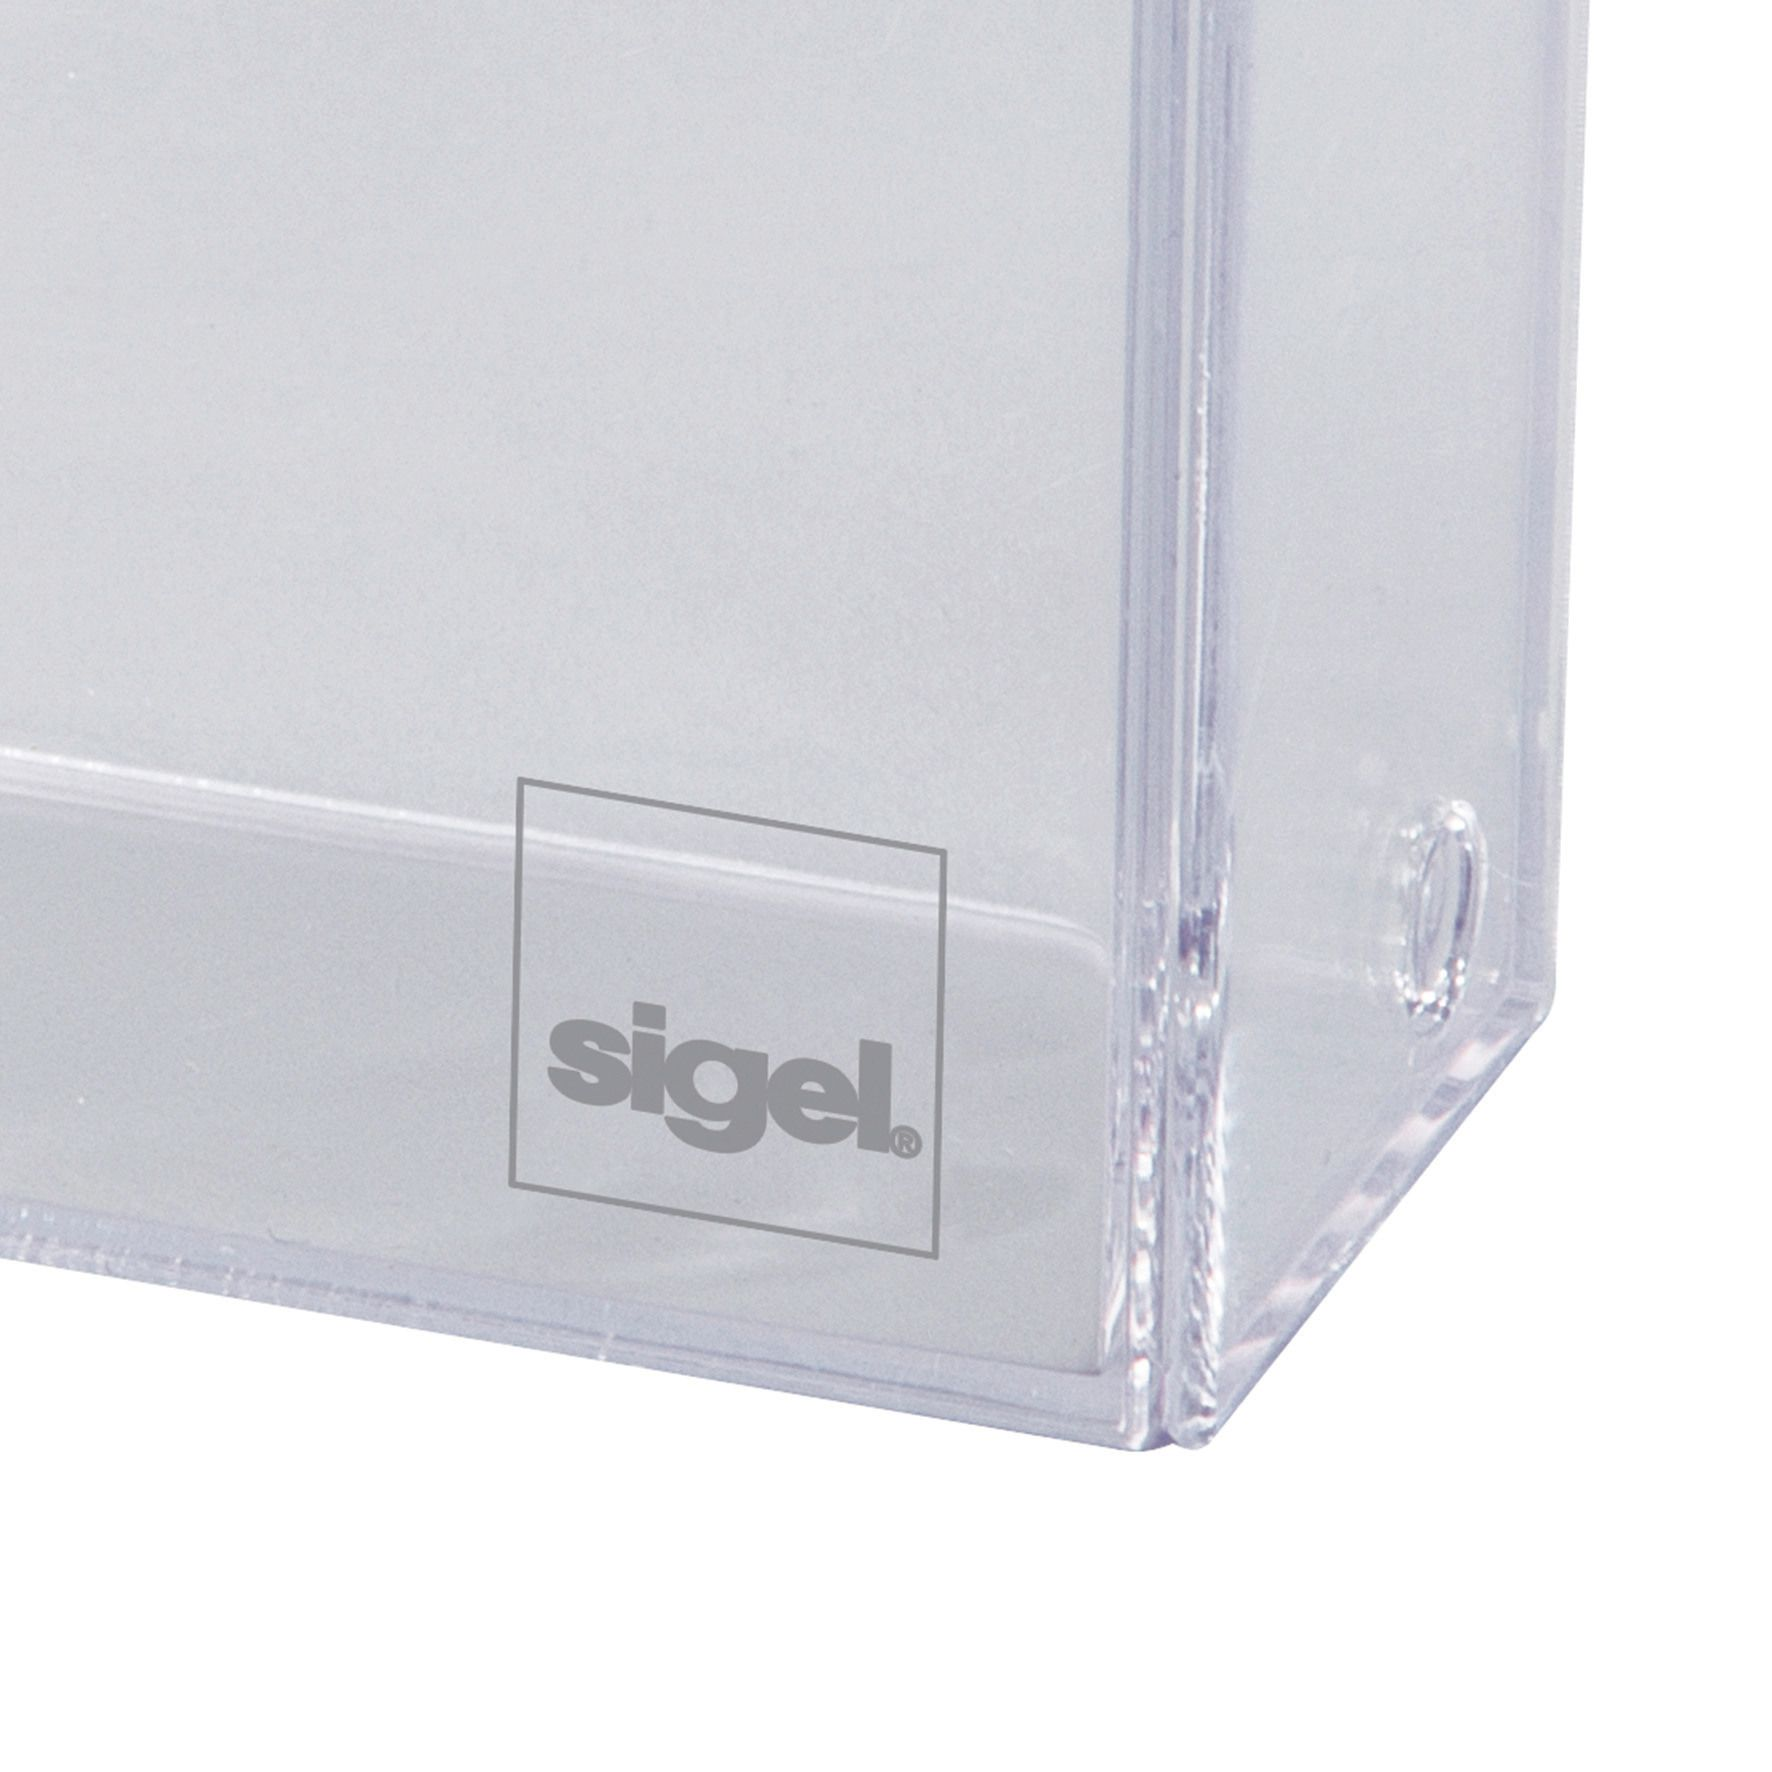 Sigel Visitenkarten Box Va110 Transp Für 100 Karten 86x55mm